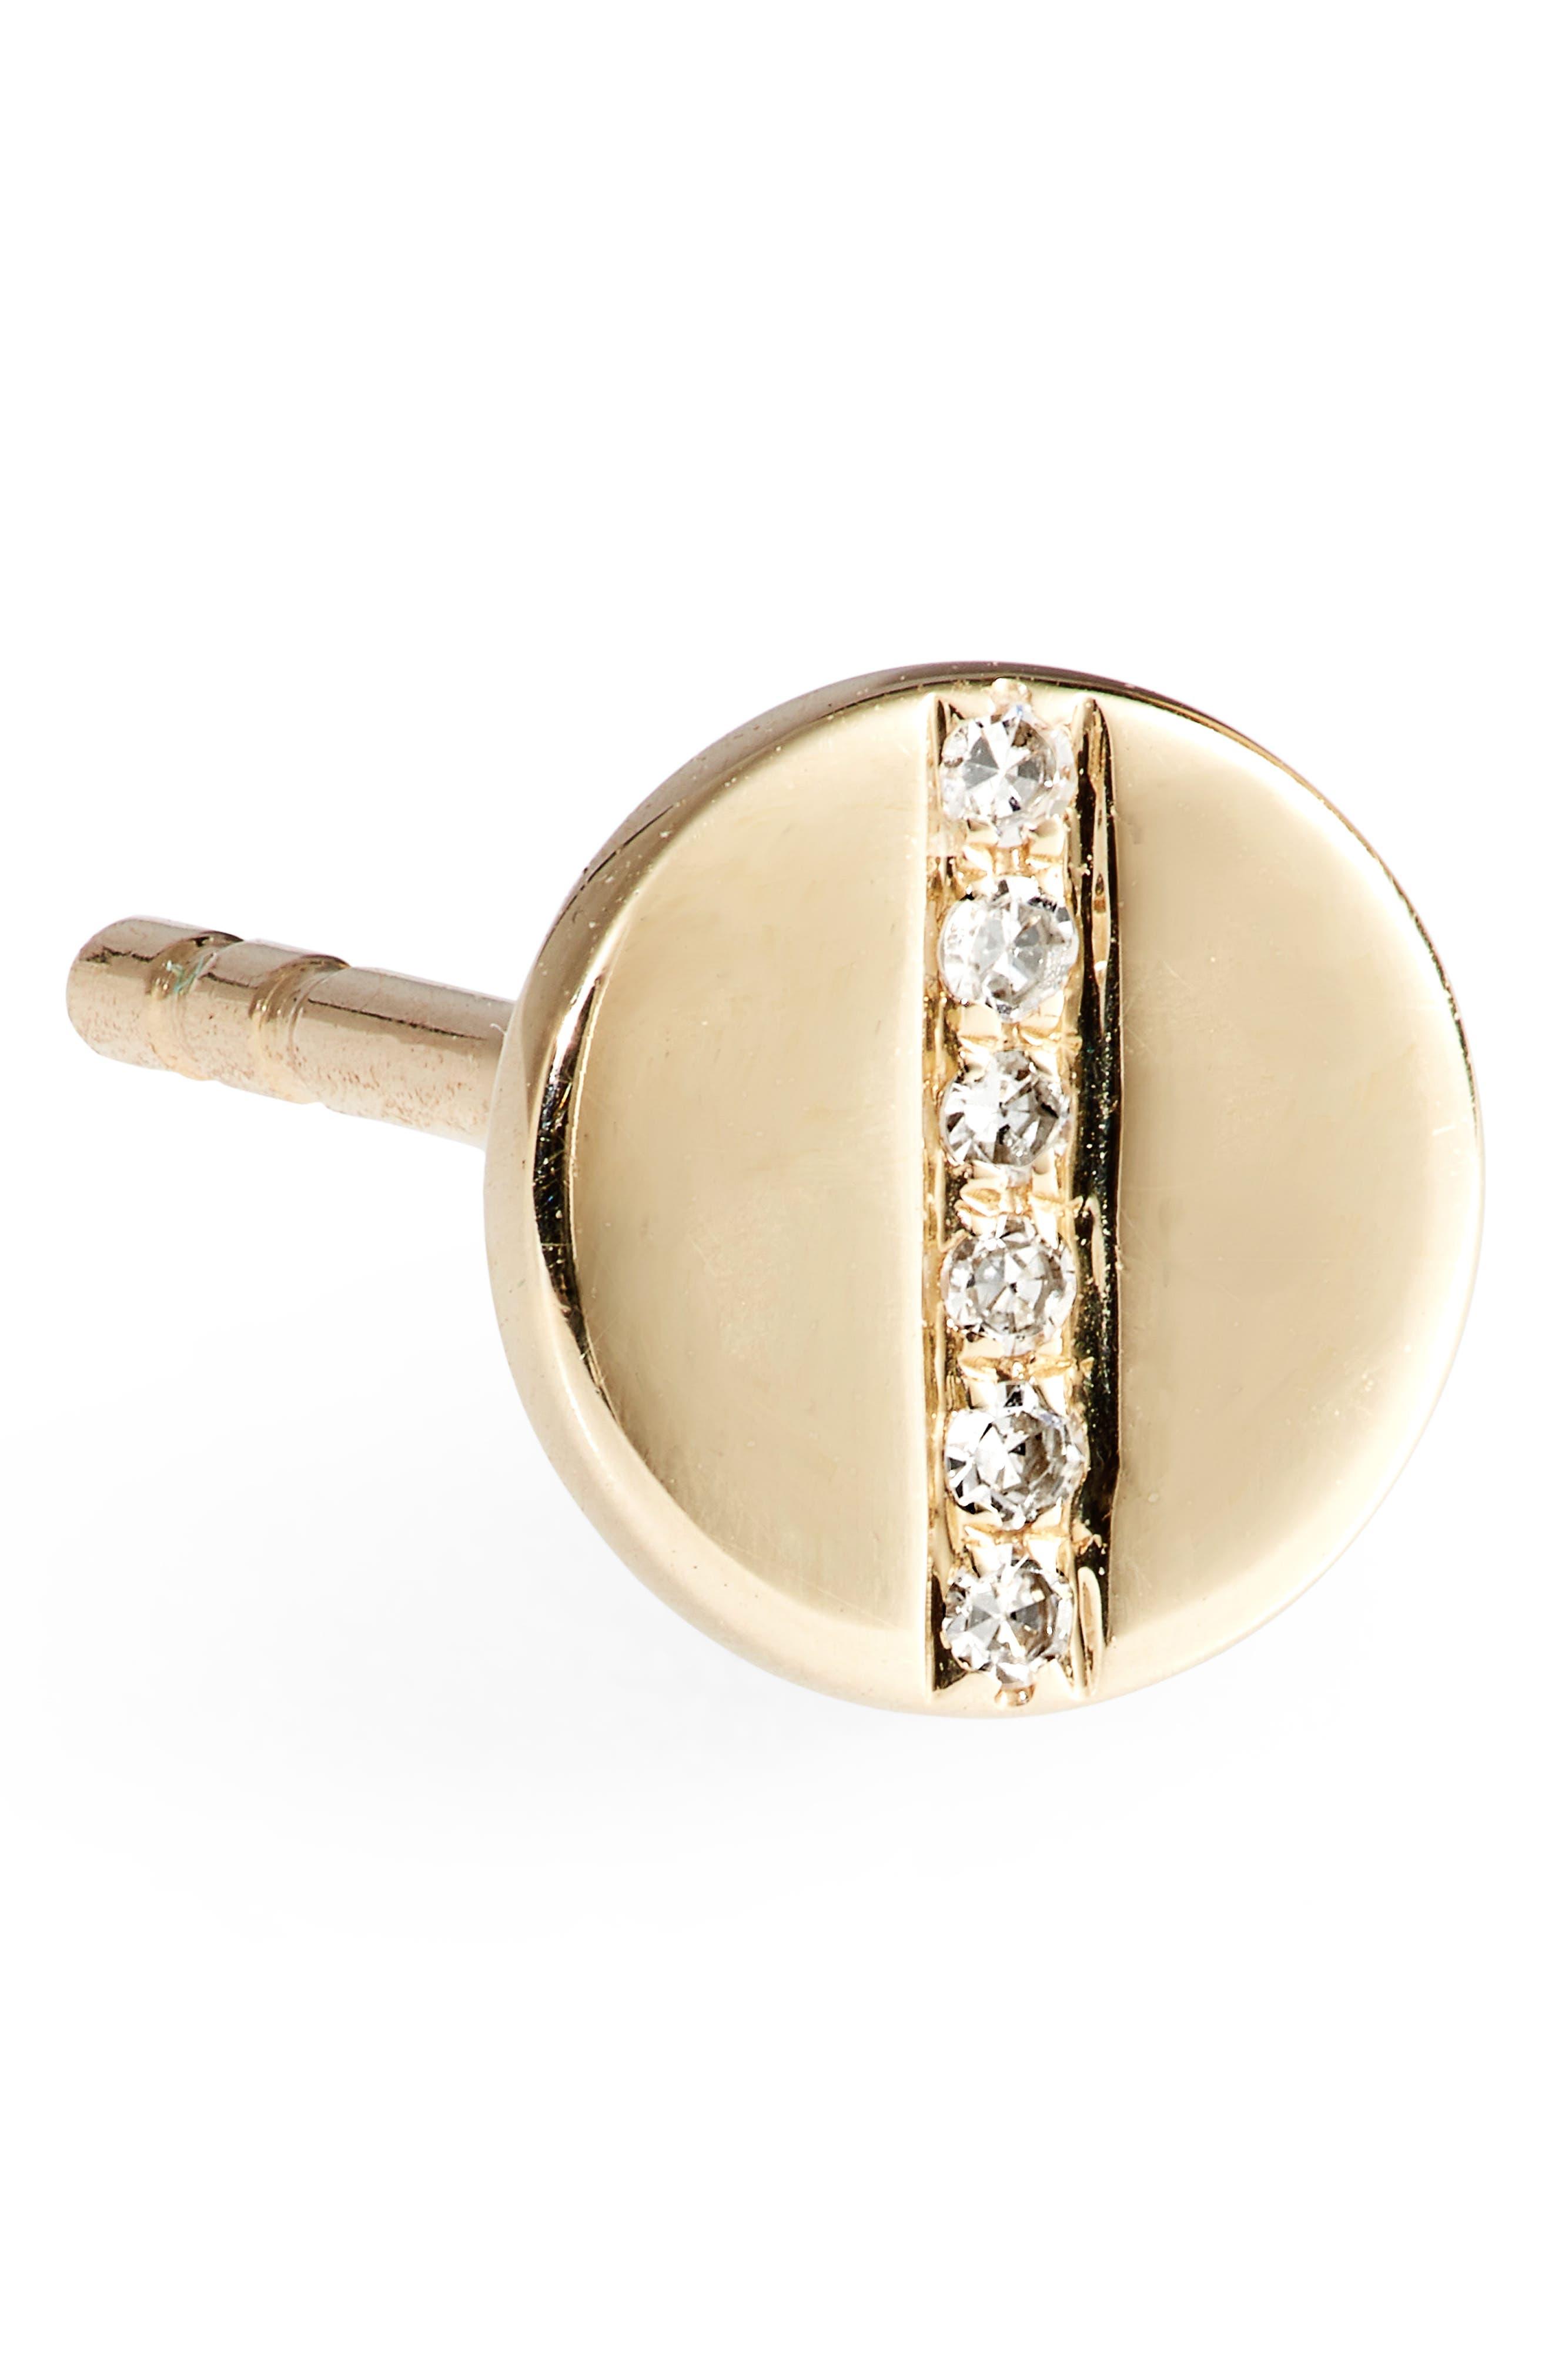 Screw Diamond Stud Earrings,                             Alternate thumbnail 5, color,                             YELLOW GOLD